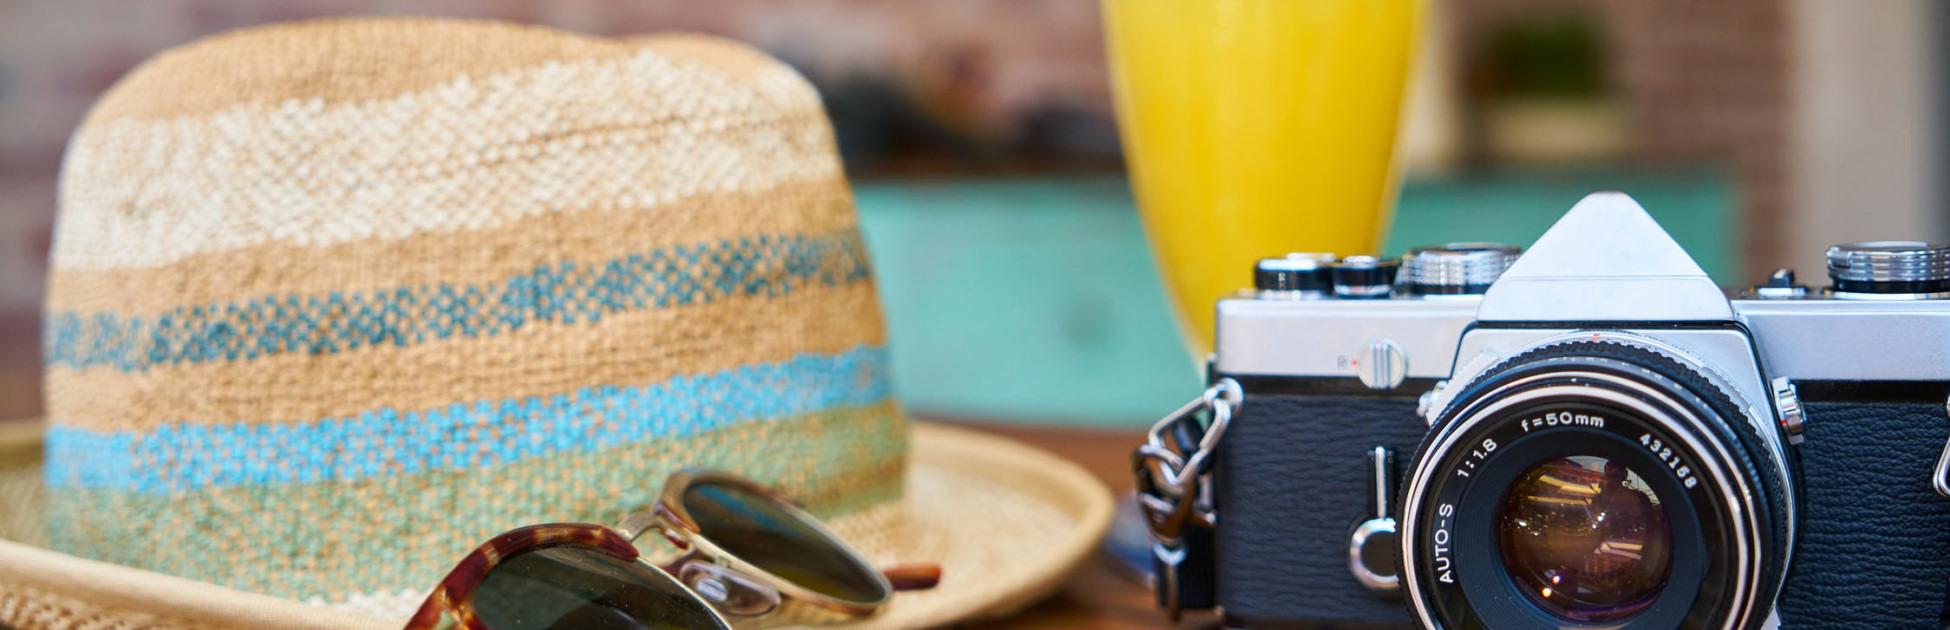 Rivonia Bed & Breakfast - Bed & Breakfast in Sandton